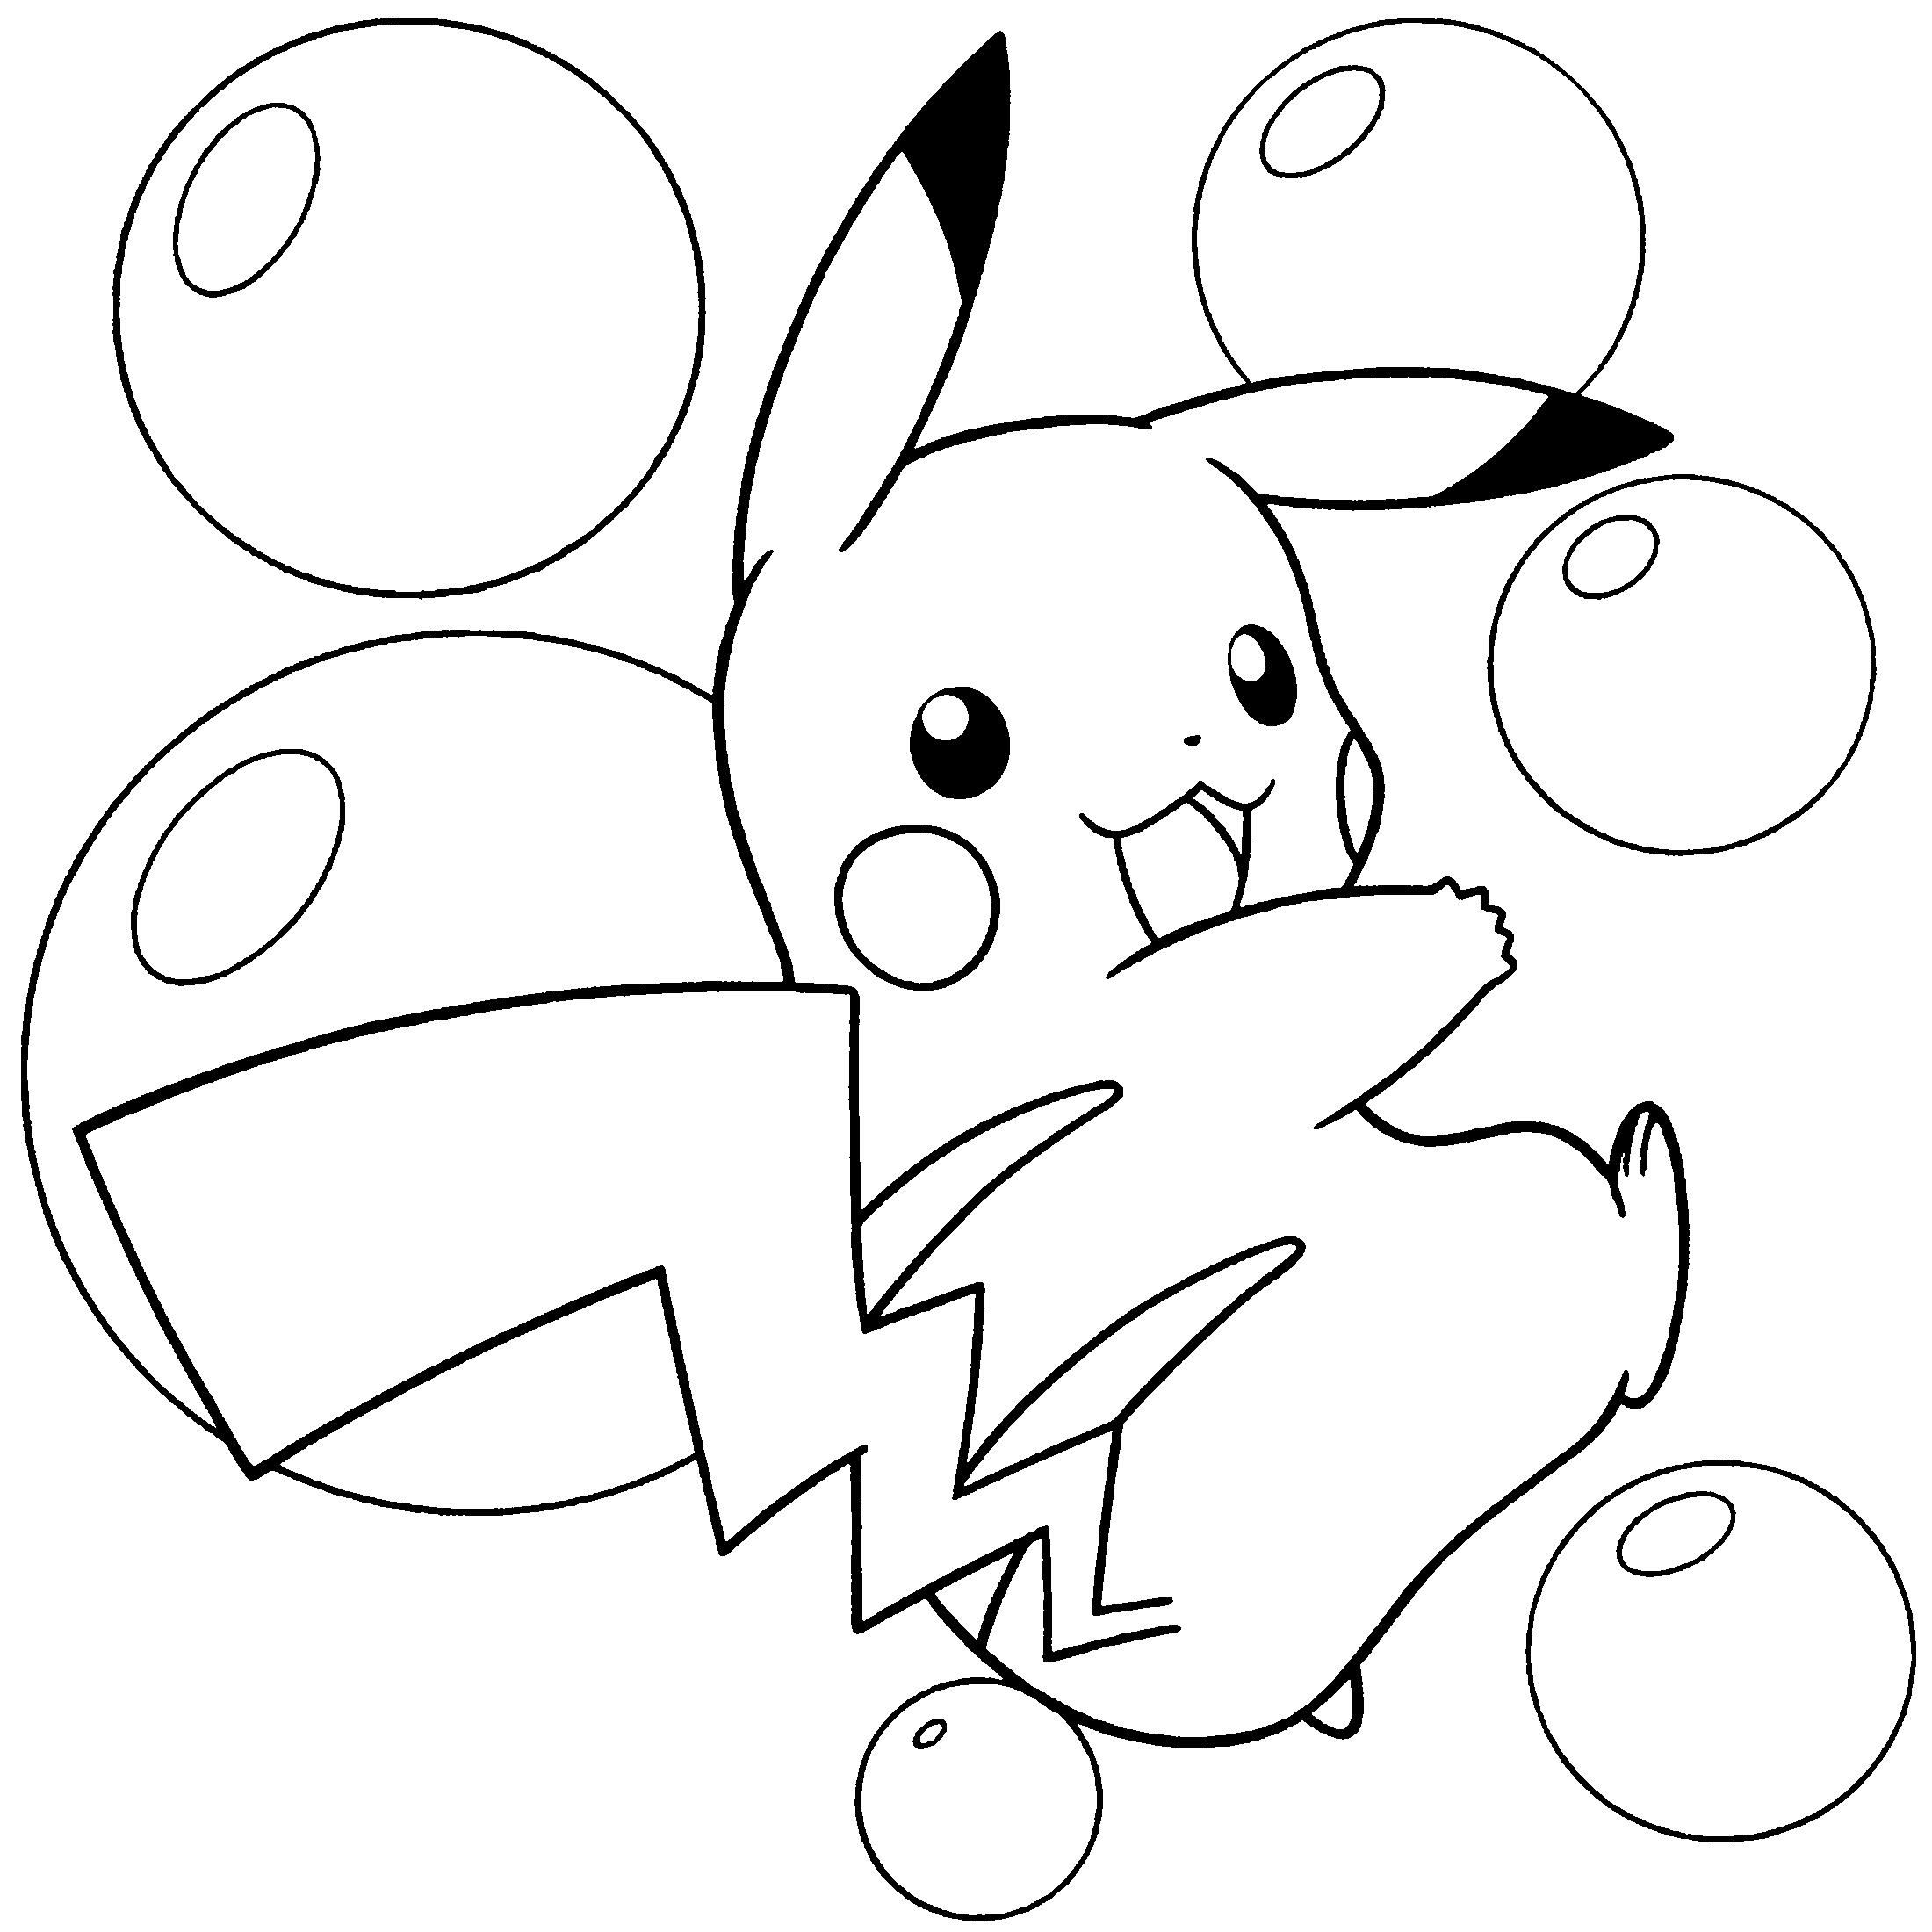 2200x2200 Enormous Pachirisu Coloring Pages Electric Pokemon Outlines